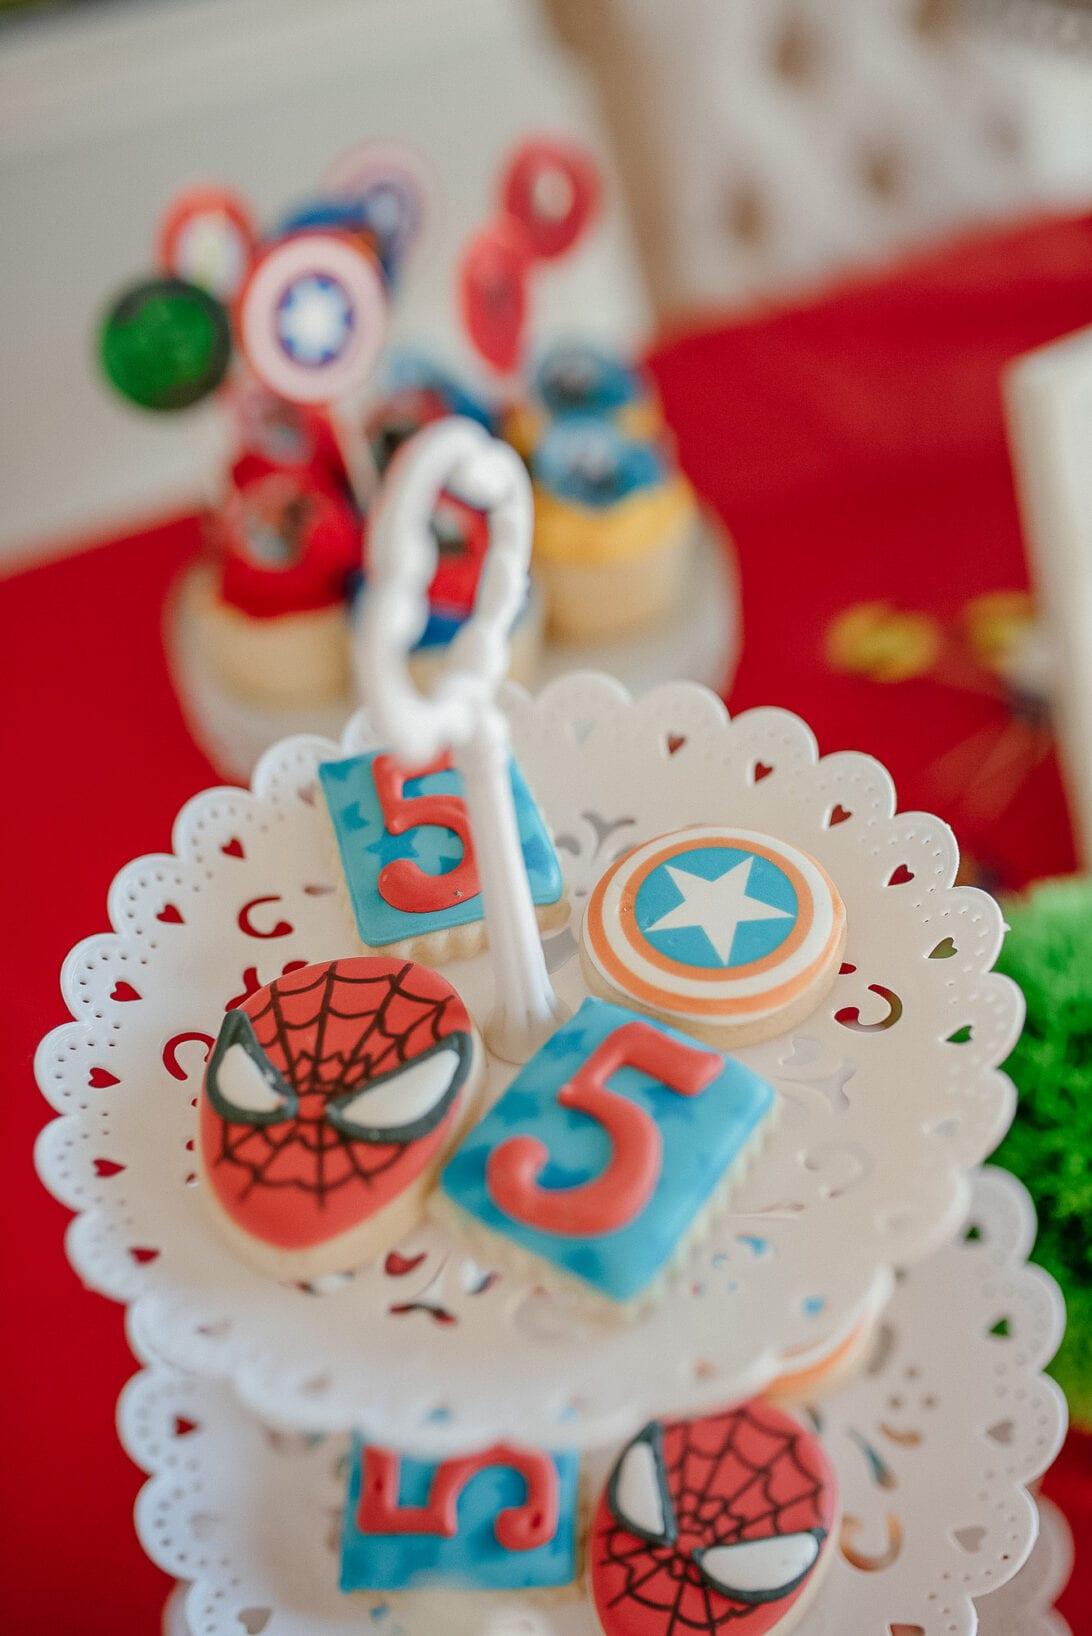 superhero cakes, Spiderman cake, Avengers cookies